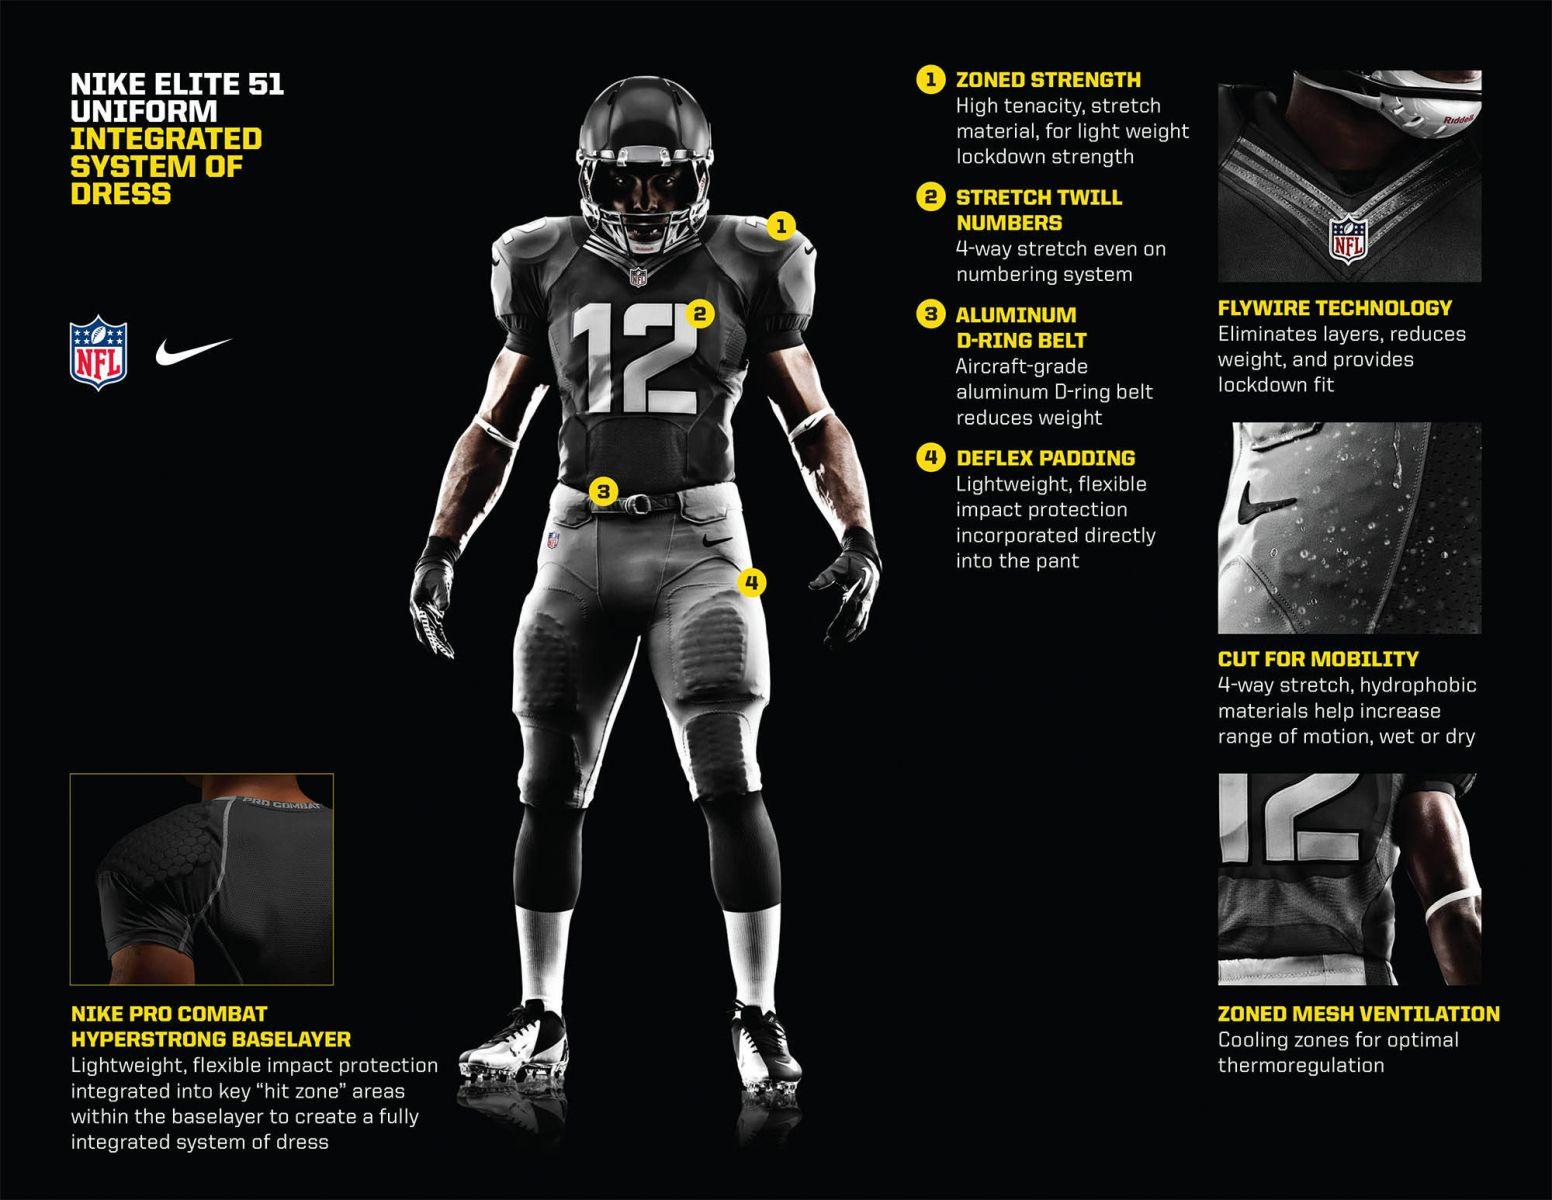 83c791700151 Nike NFL 2012 Elite 51 Uniform Tech Sheet